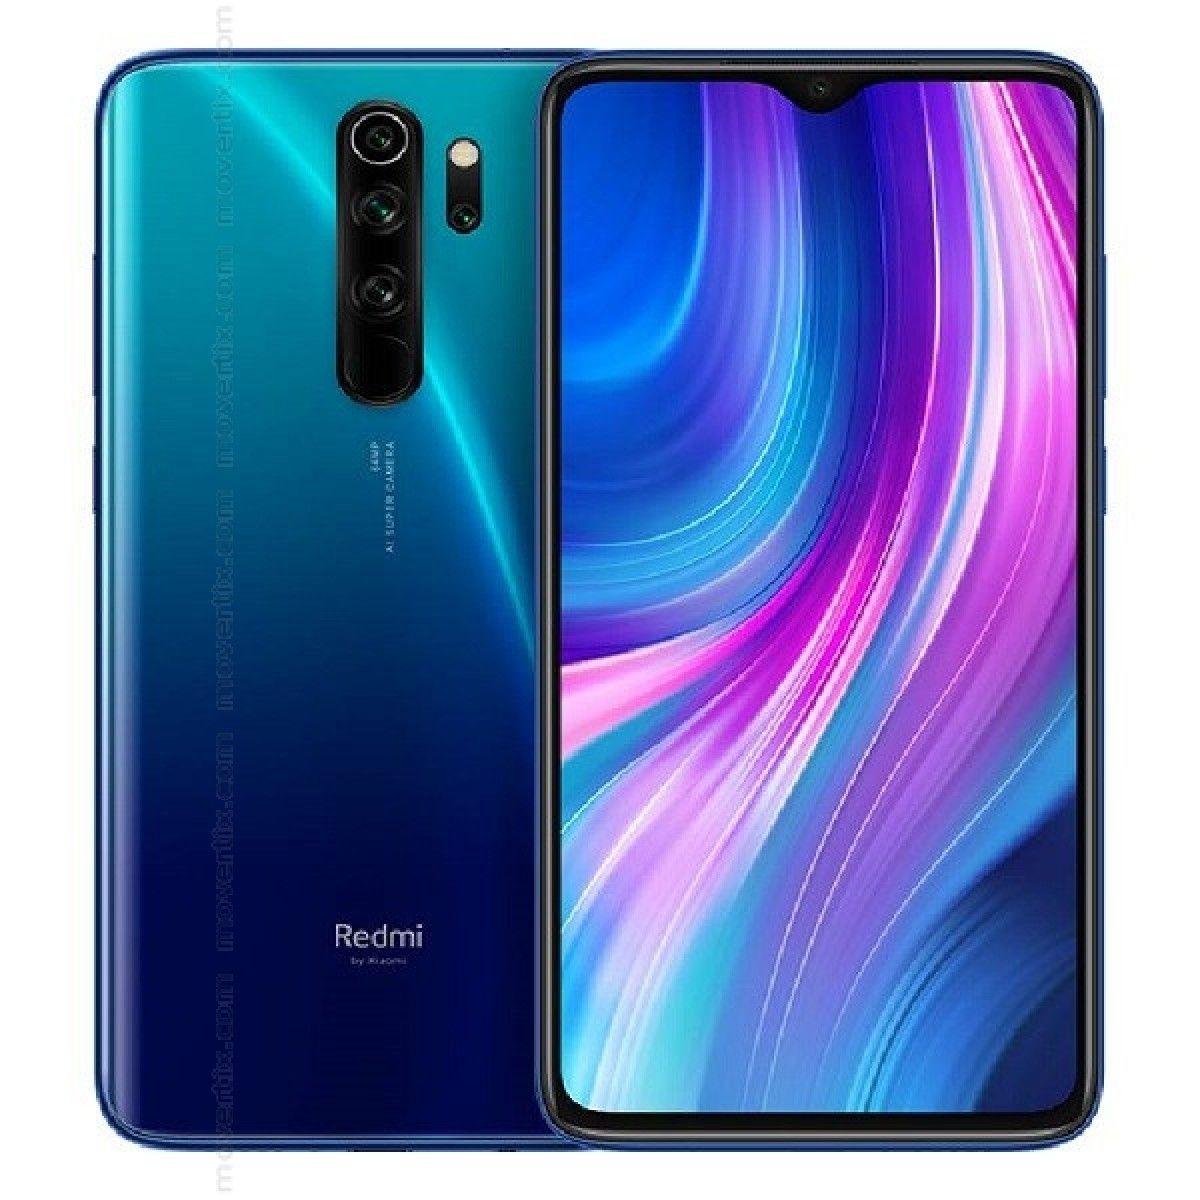 smartphone-xiaomi-redmi-note-8-pro-6-53-2340x1080-android-9-0-dual-sim-desbloqueado-